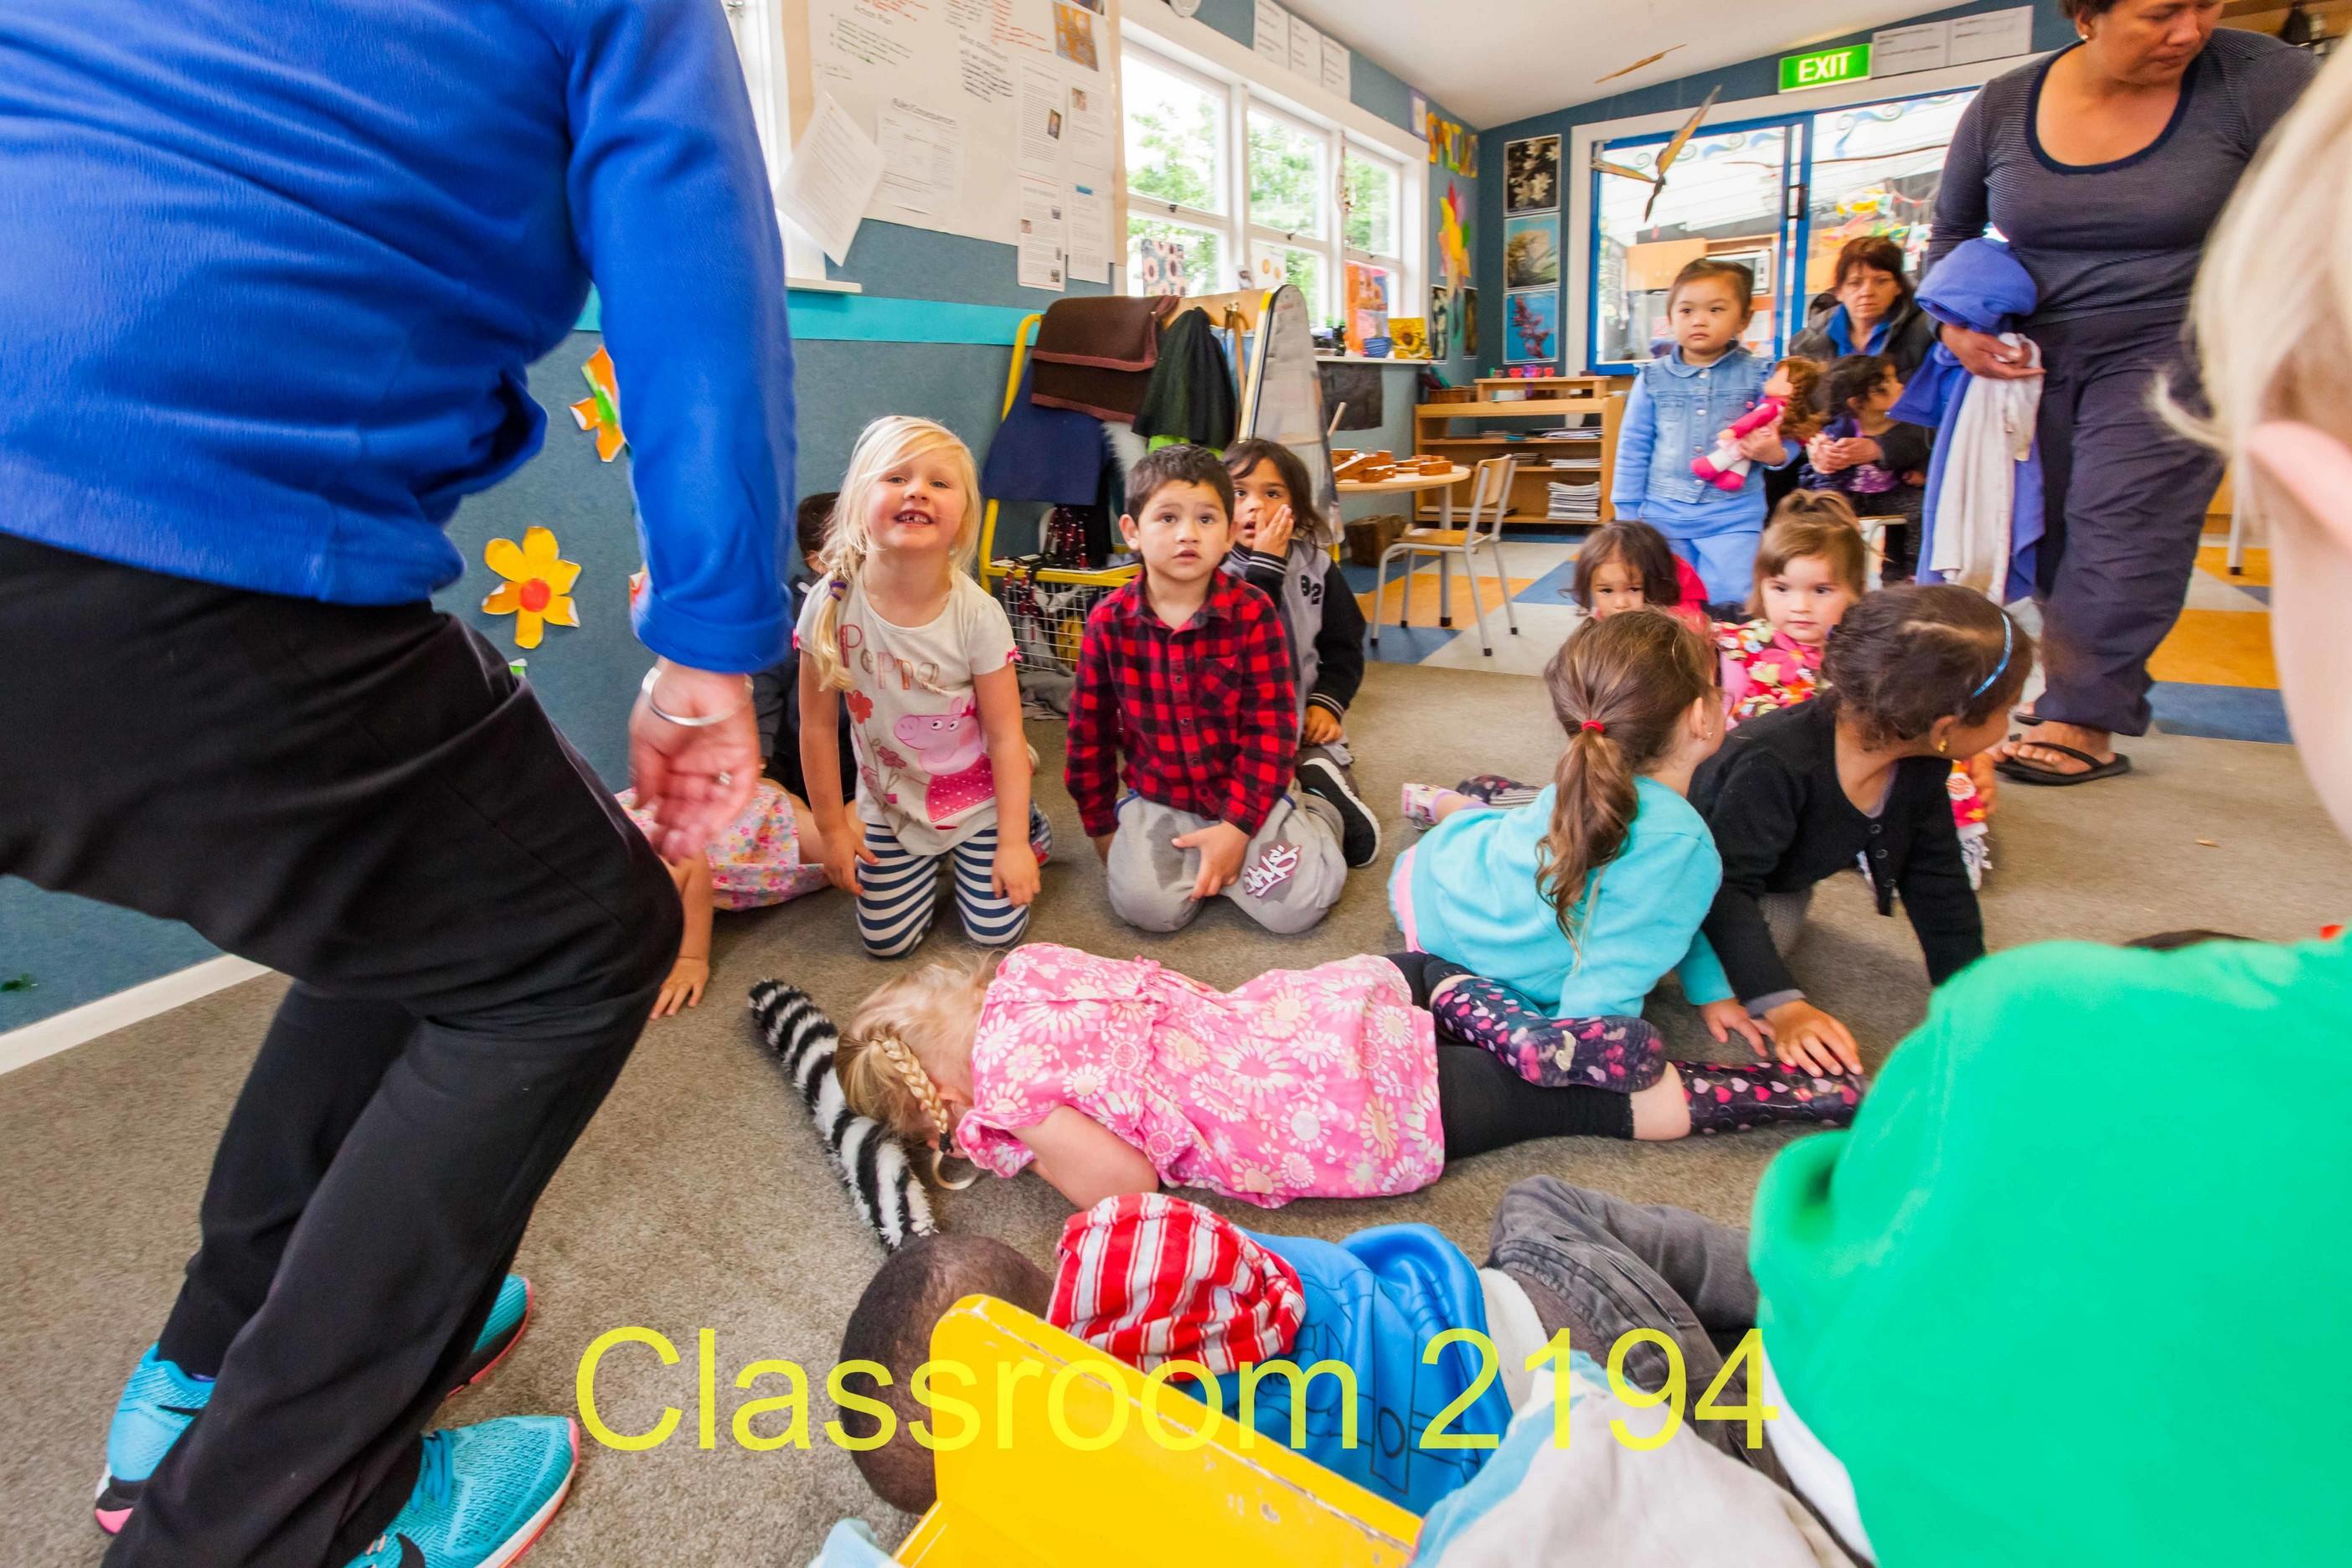 Classroom 2194